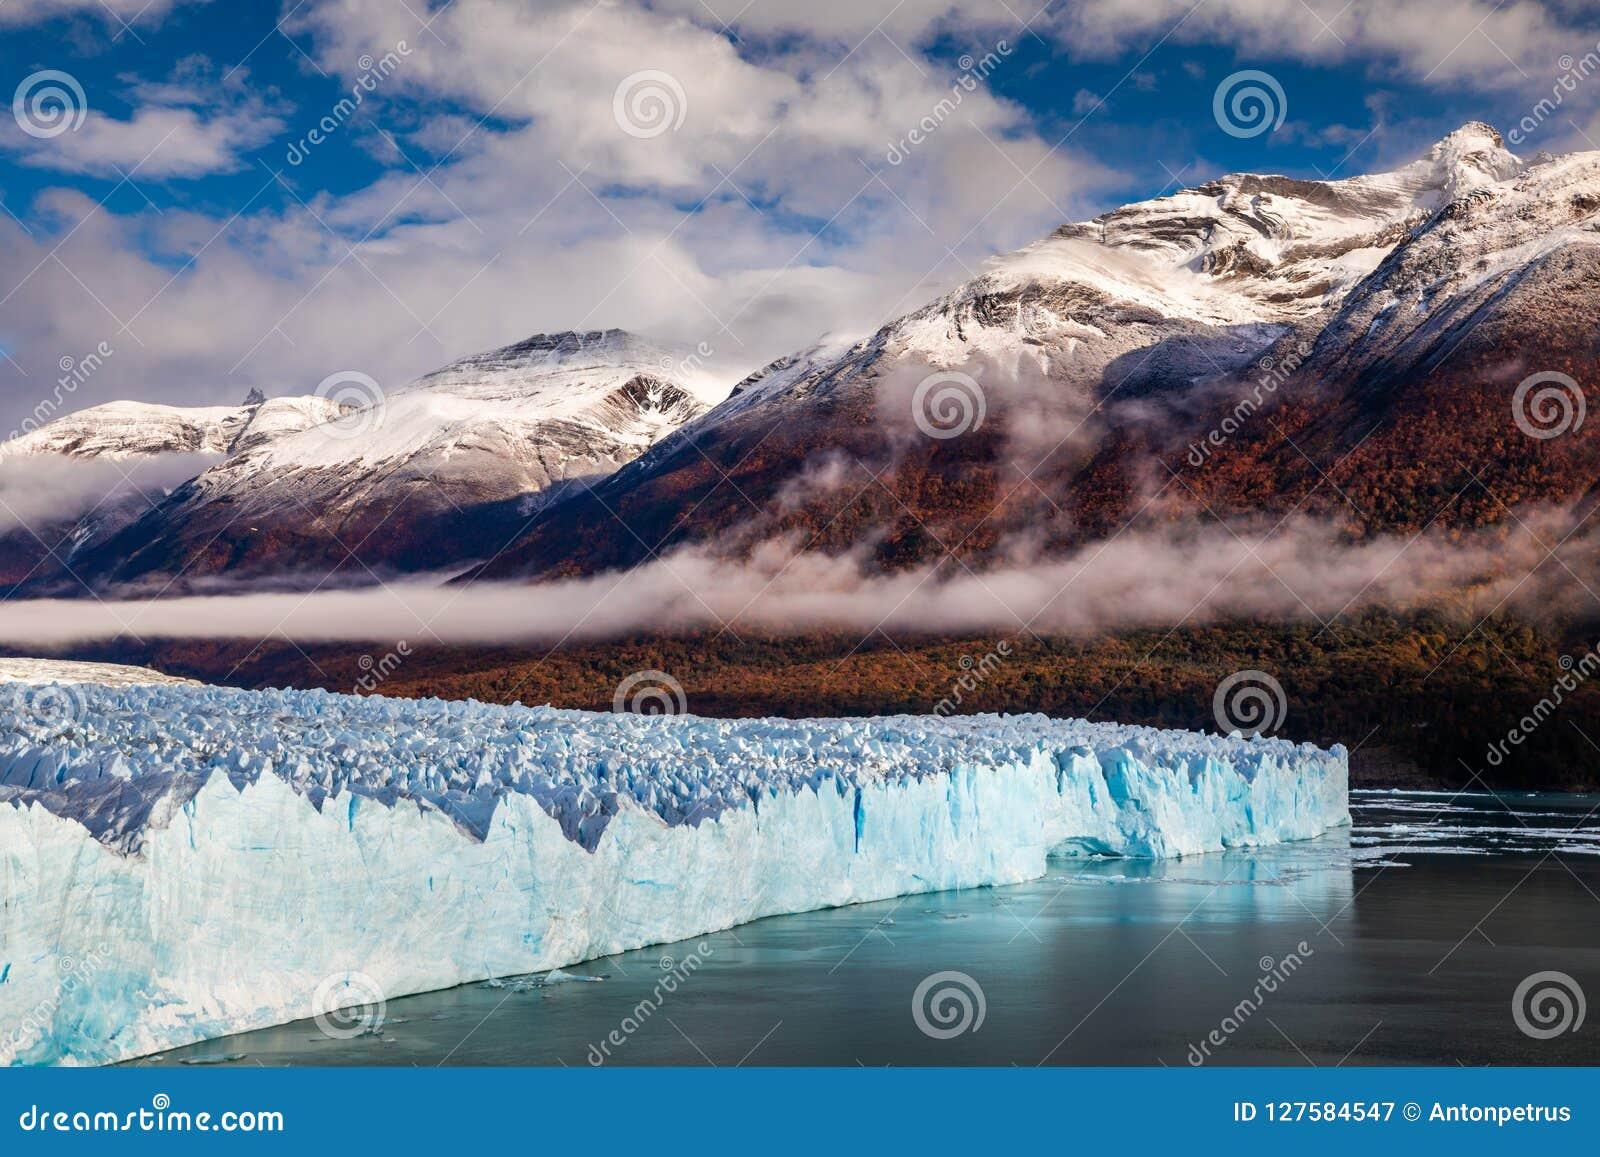 Gletscher Perito Moreno National Park im Herbst Argentinien, Patagonia